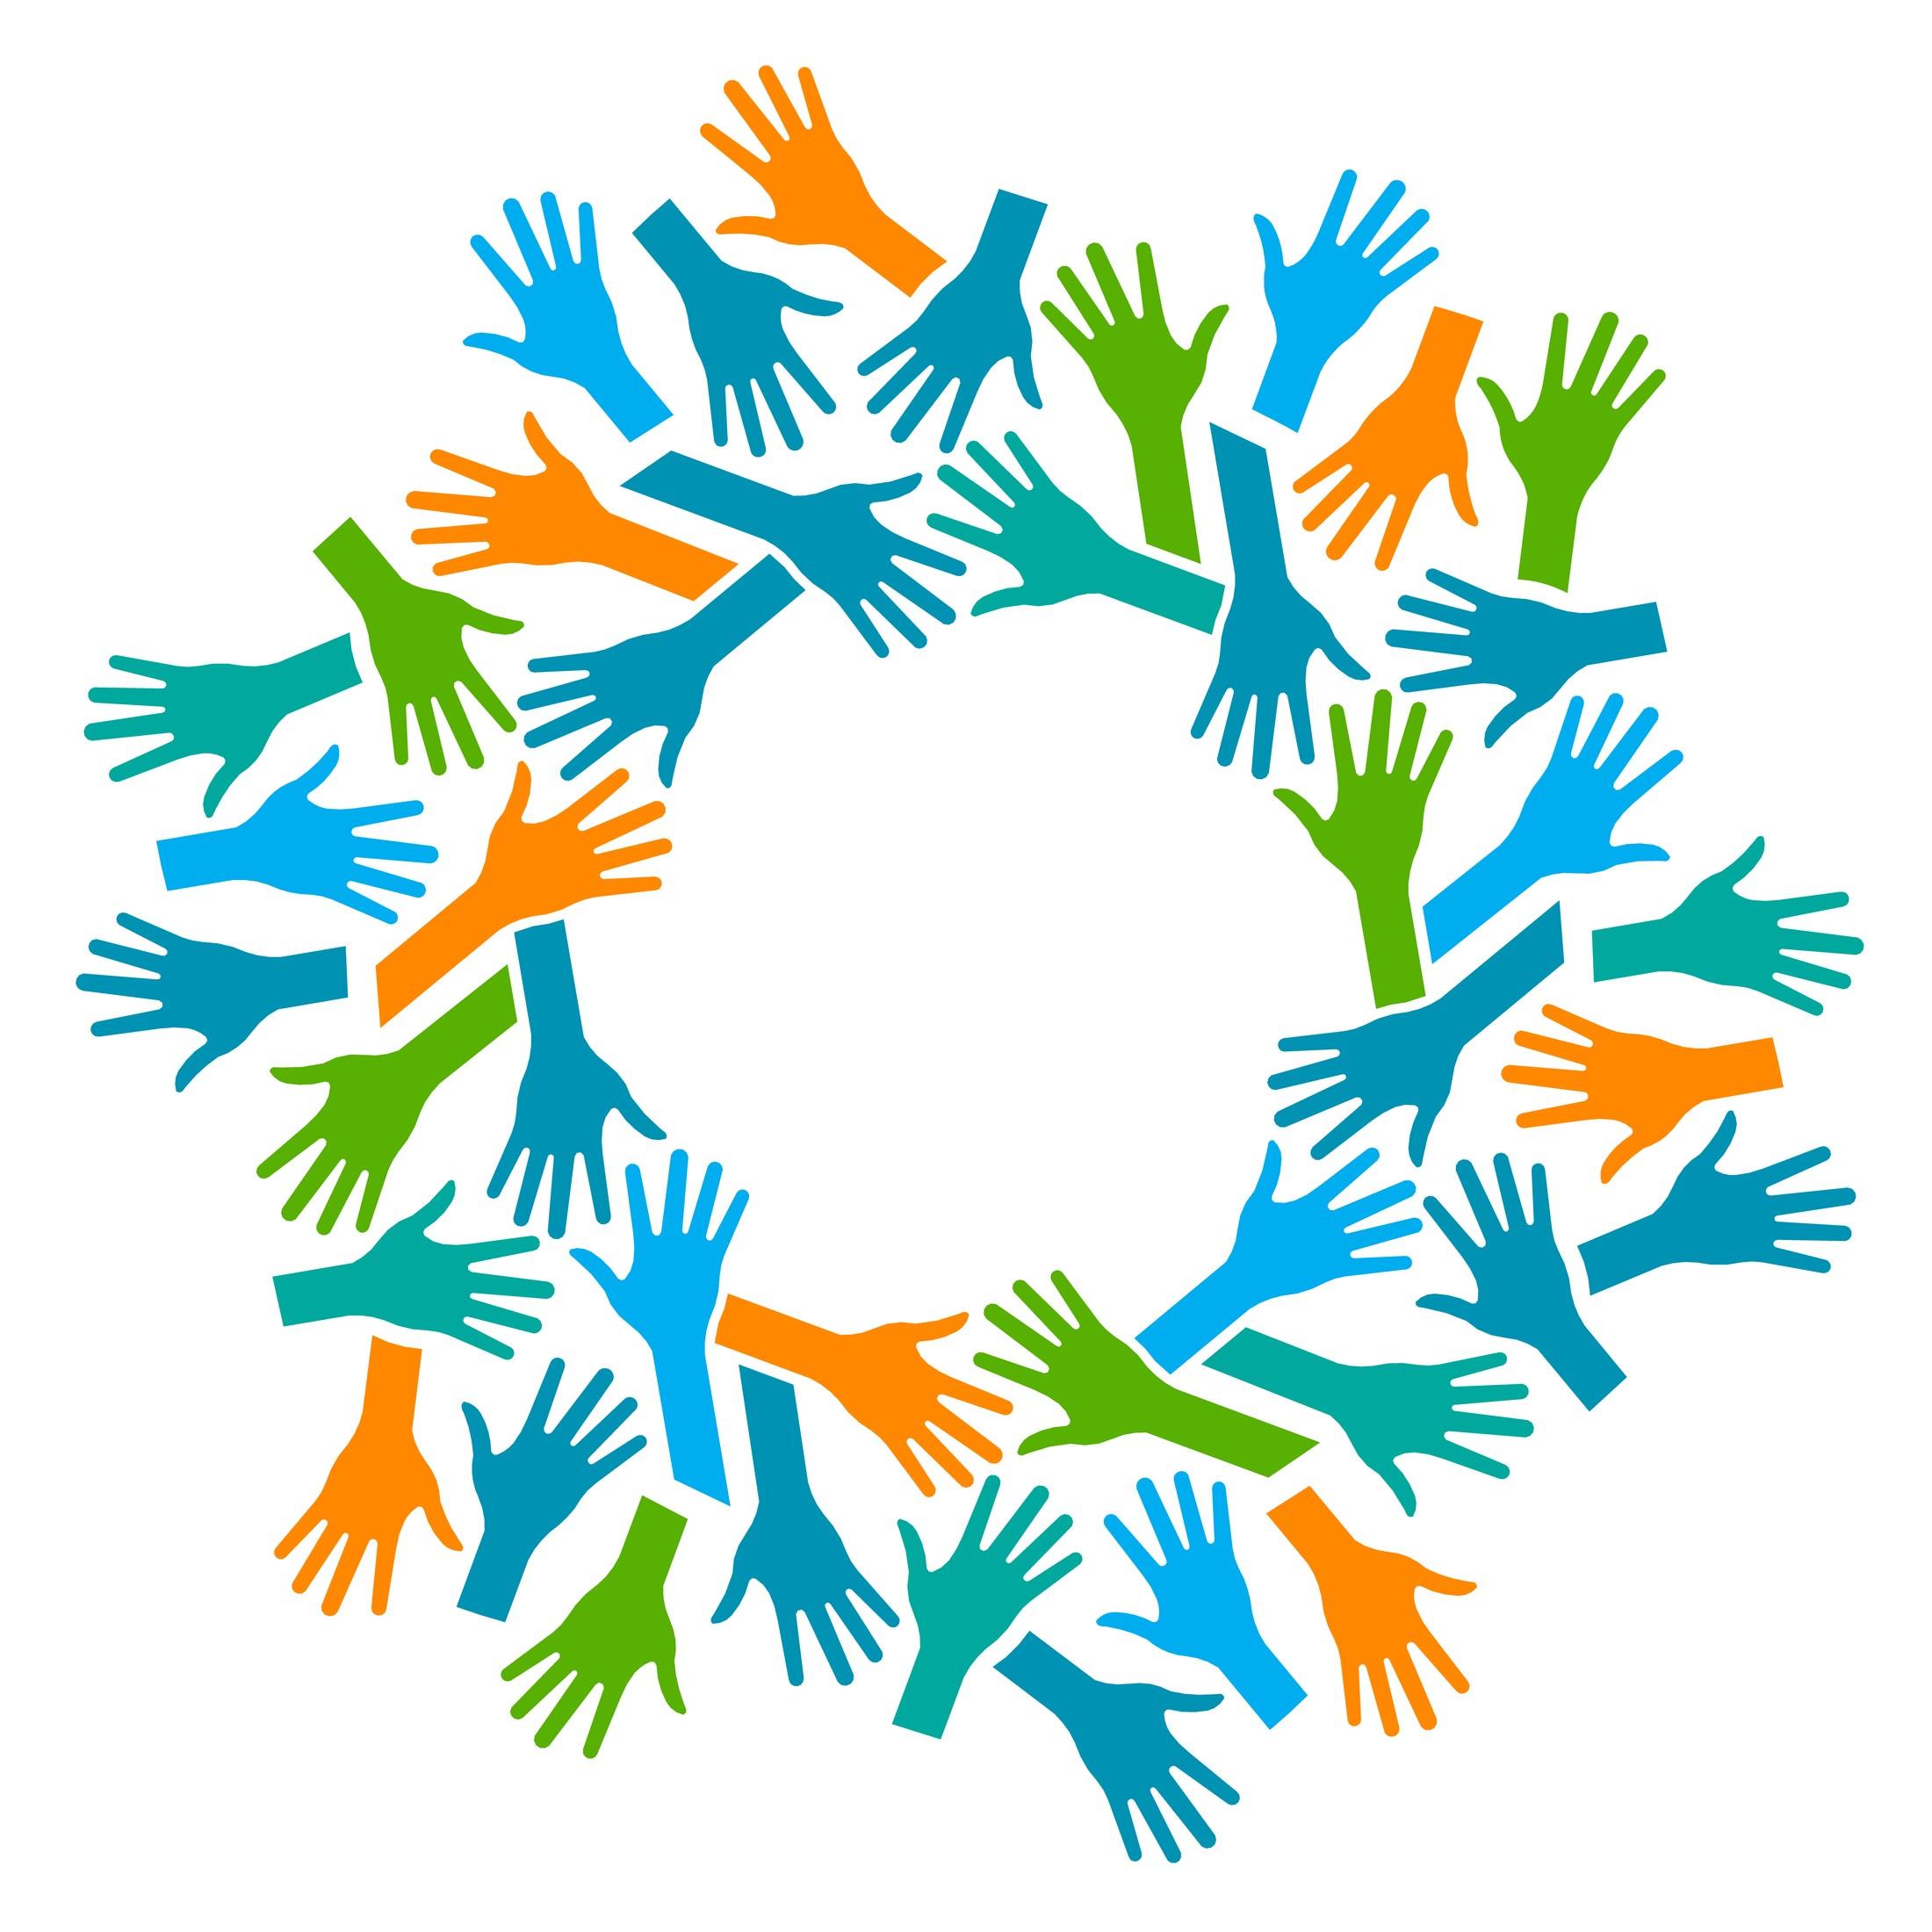 Collaboration clipart school community. Home partnerships lake elsinore